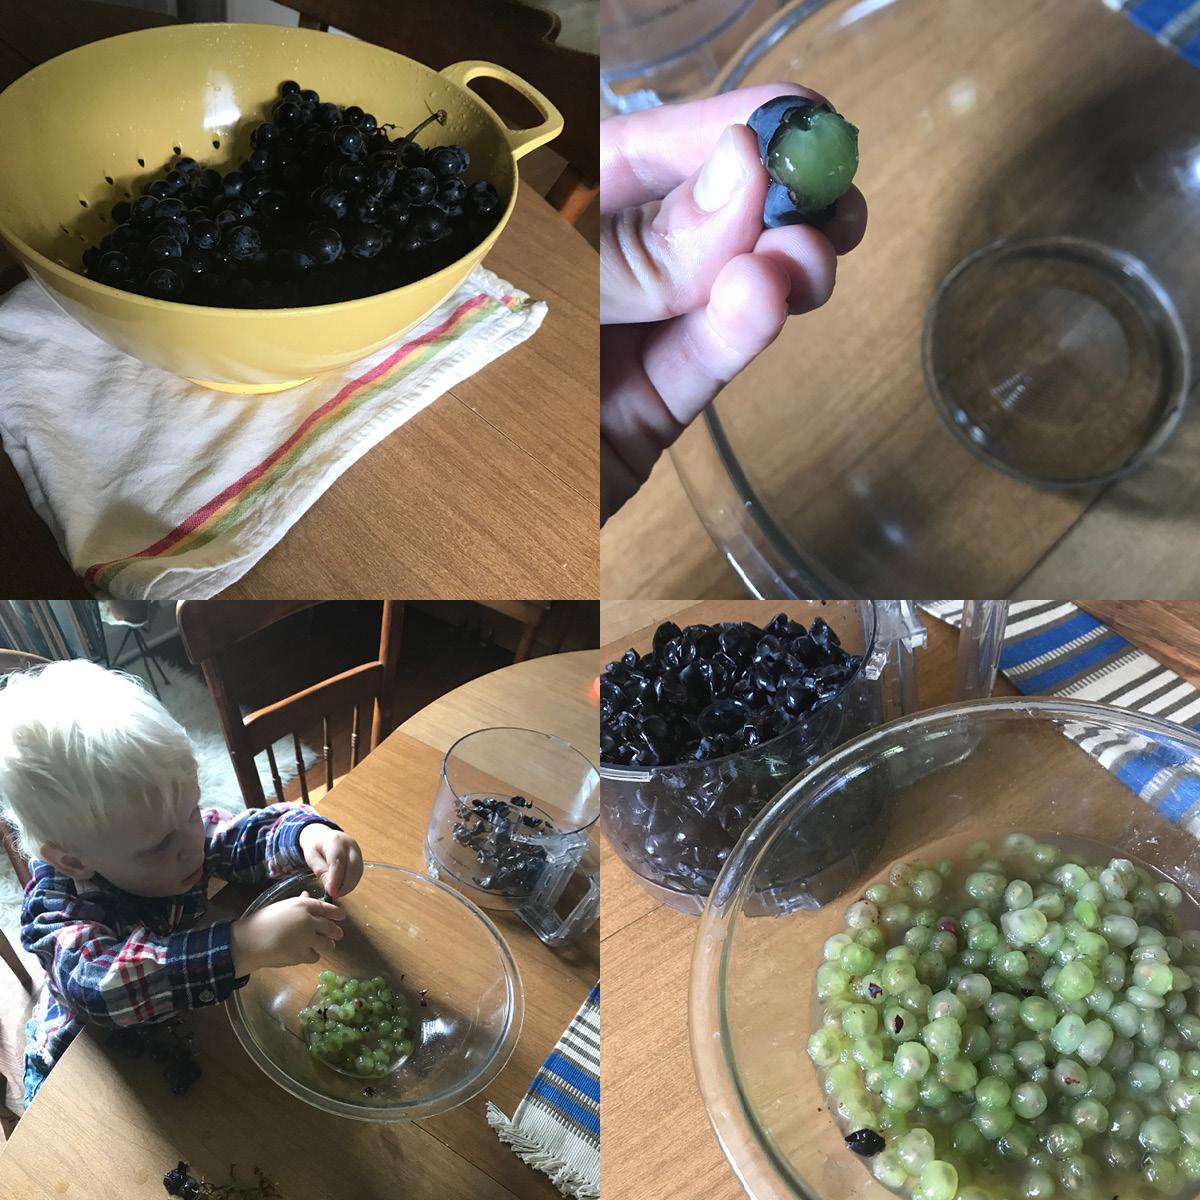 grape skin, processing concord grapes, jam making